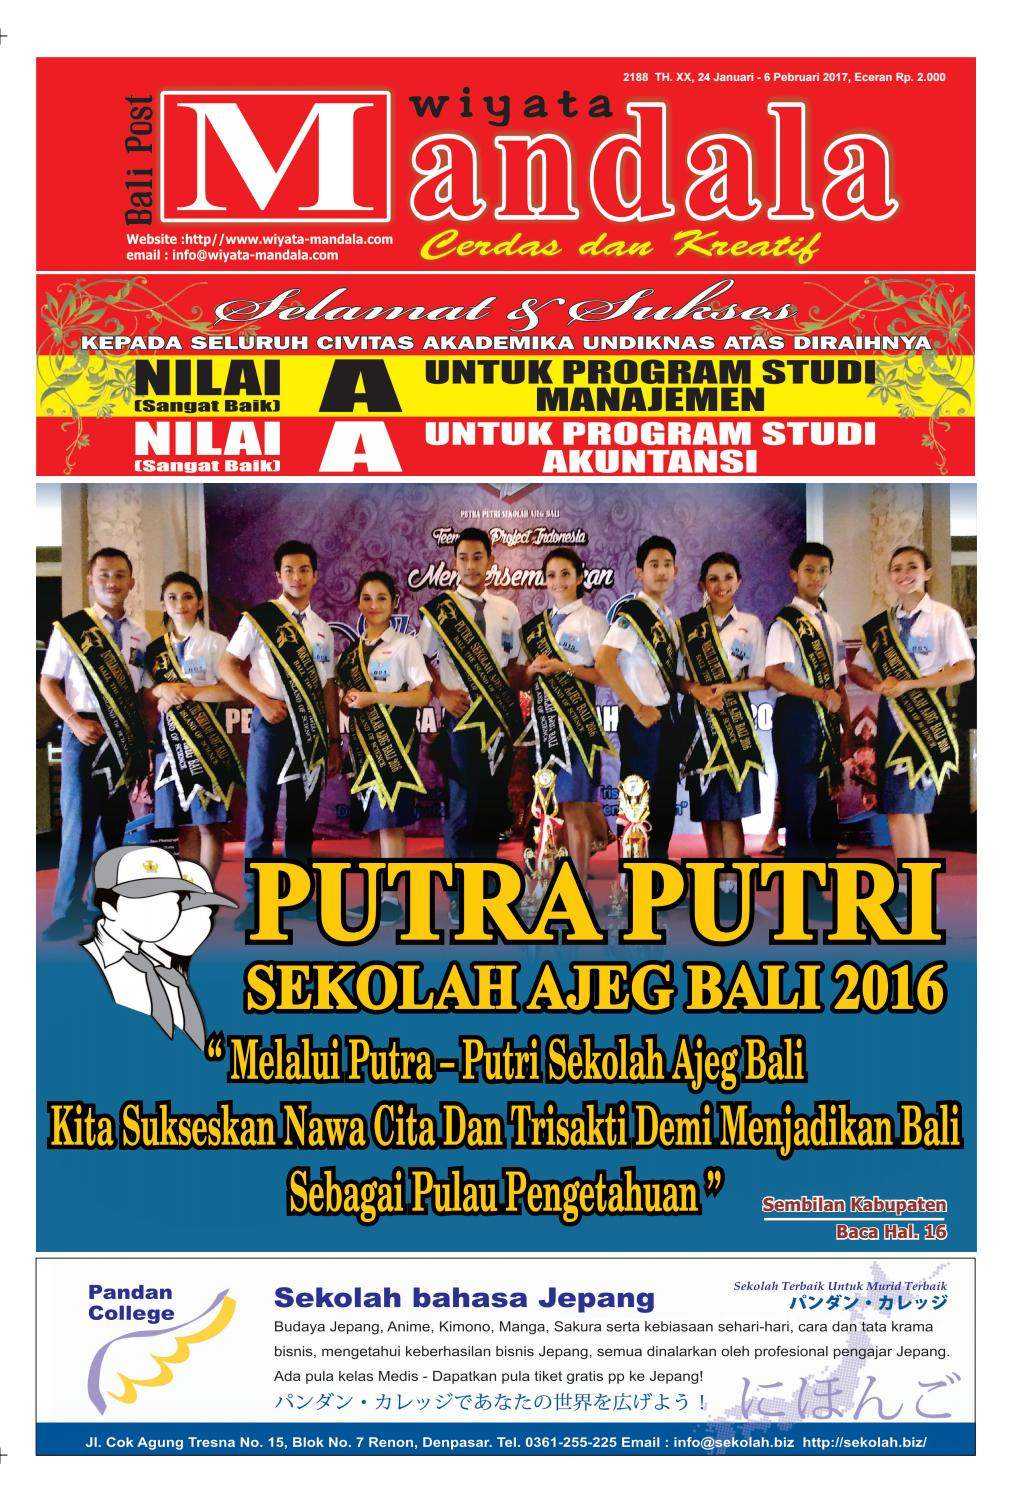 Edisi 24 Januari 2017 Wiyata Mandala By Wiyata Mandala Issuu